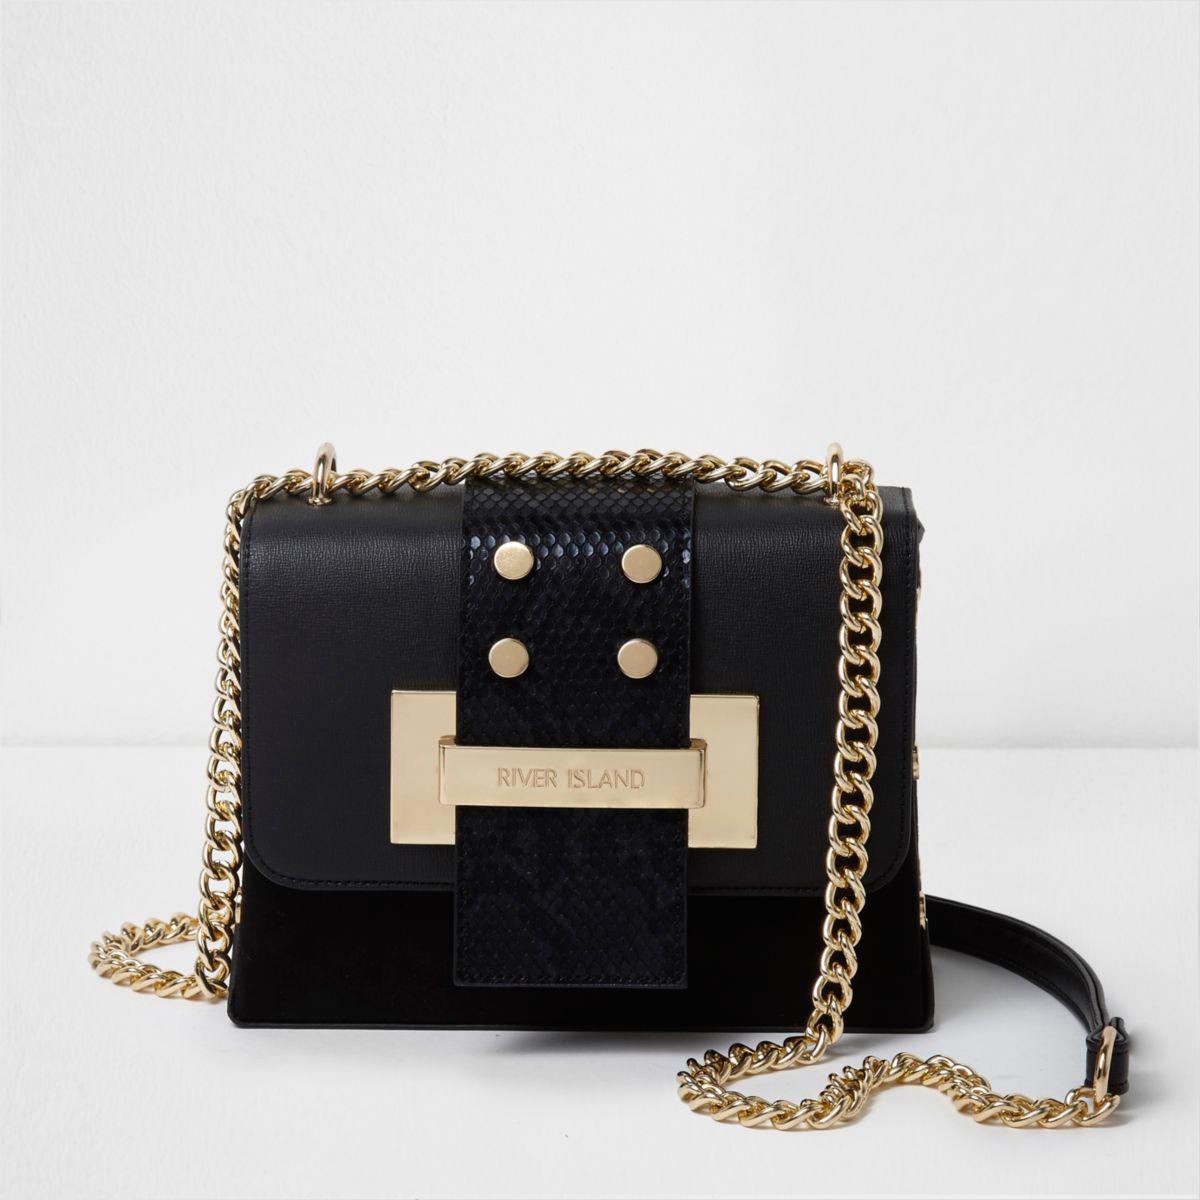 0dd9f125e6 Lyst - River Island Black And Gold Tone Chain Cross Body Bag in Black